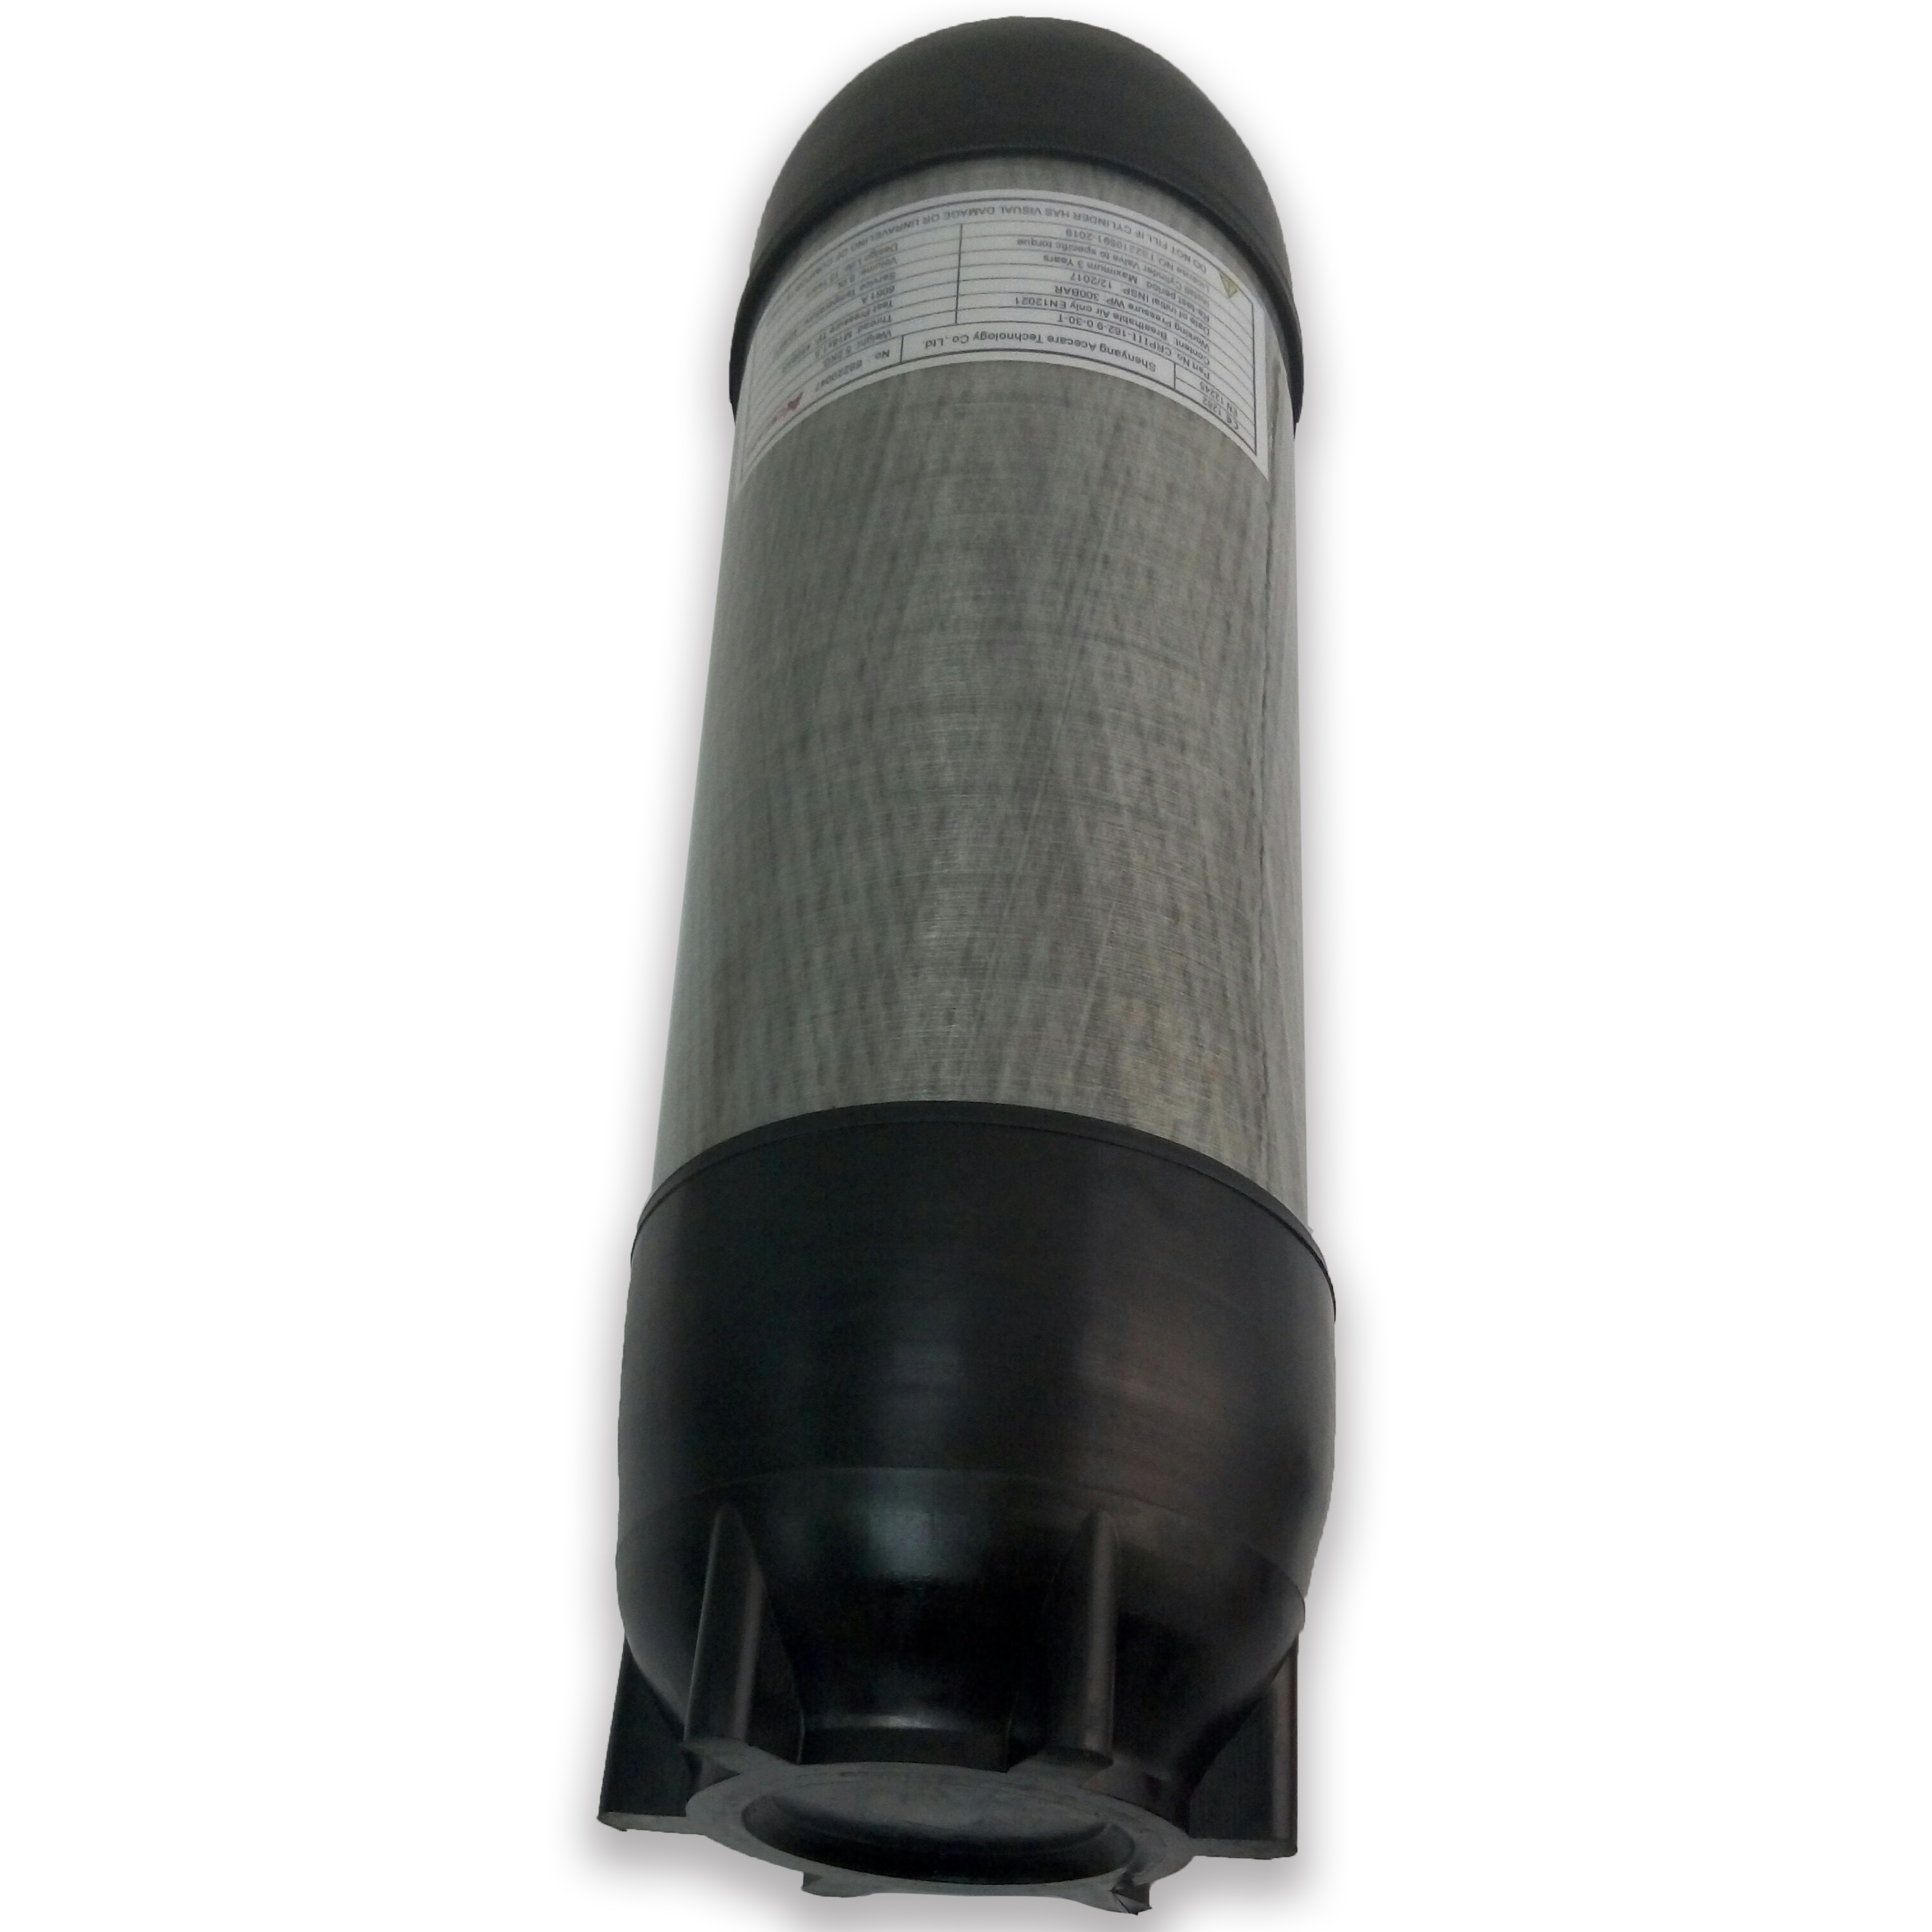 AC16891 6.8L Carbon Fiber Scba Paintball Tank Bottle Cylinder 300Bar 4500Psi Air Gun Pcp High Pressure Cylinder Underwater Gun